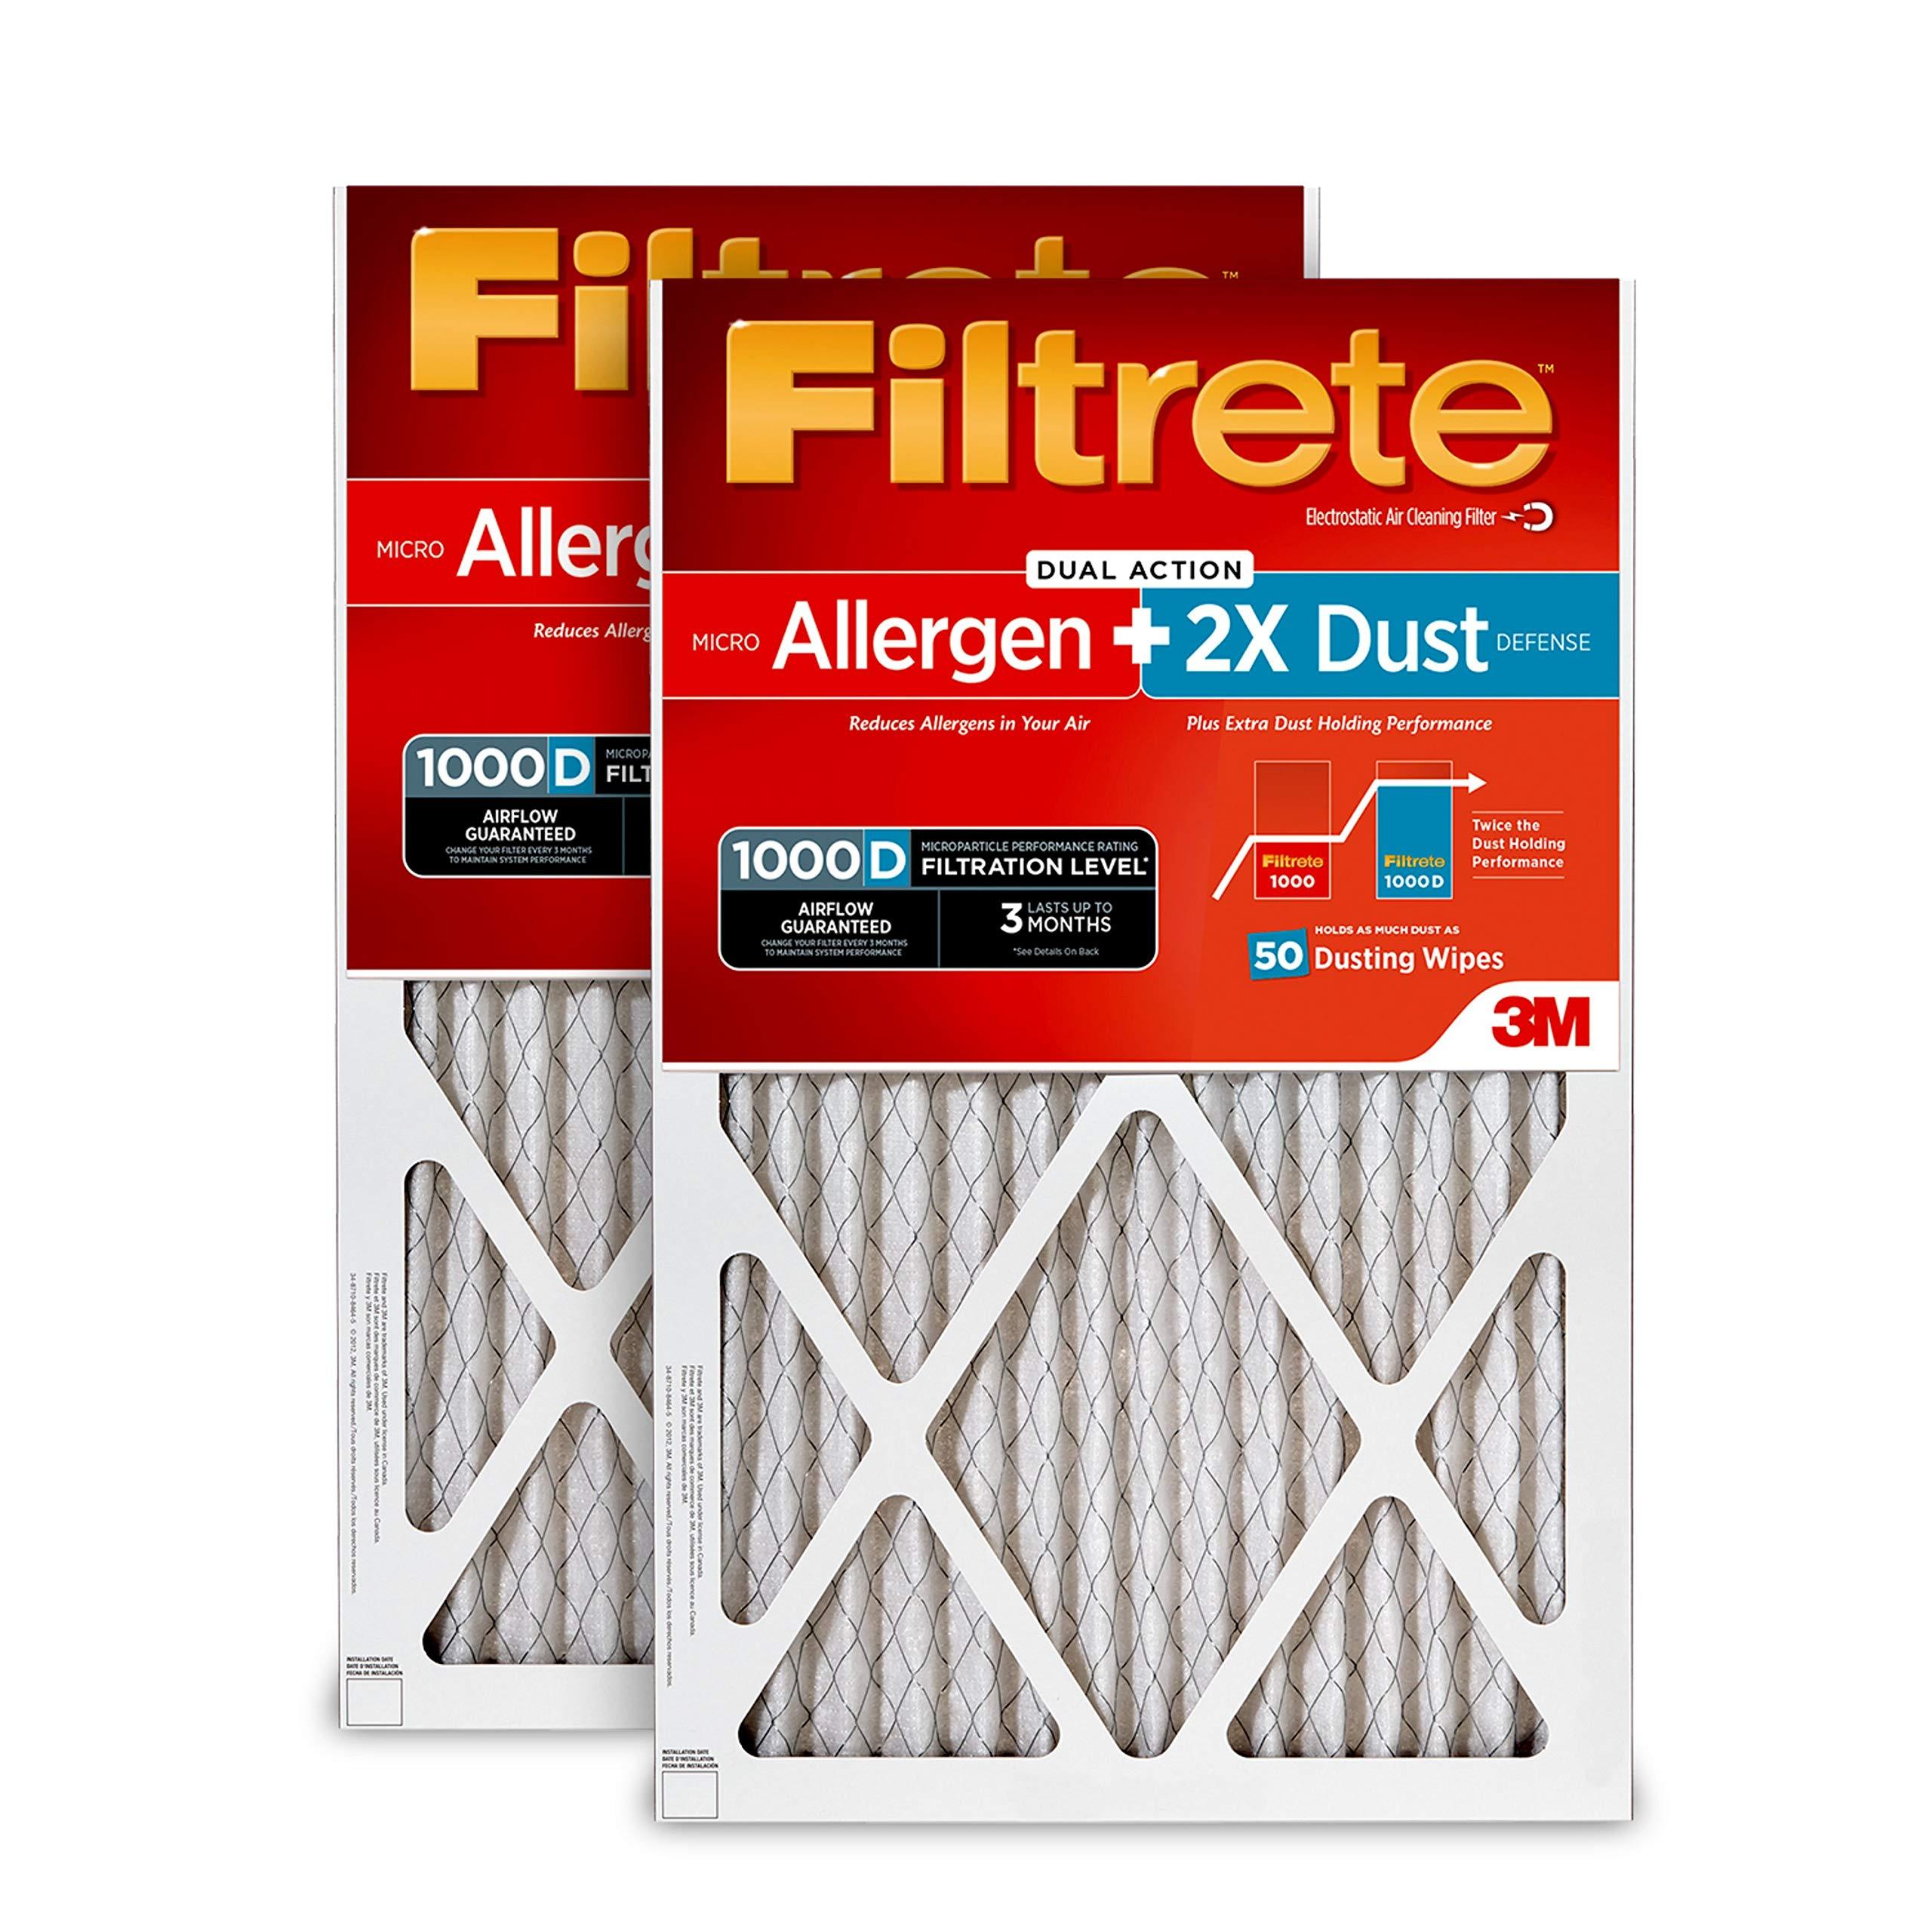 Filtrete 16x25x1, AC Furnace Air Filter, MPR 1000D, Micro Allergen PLUS DUST, 2-Pack by Filtrete